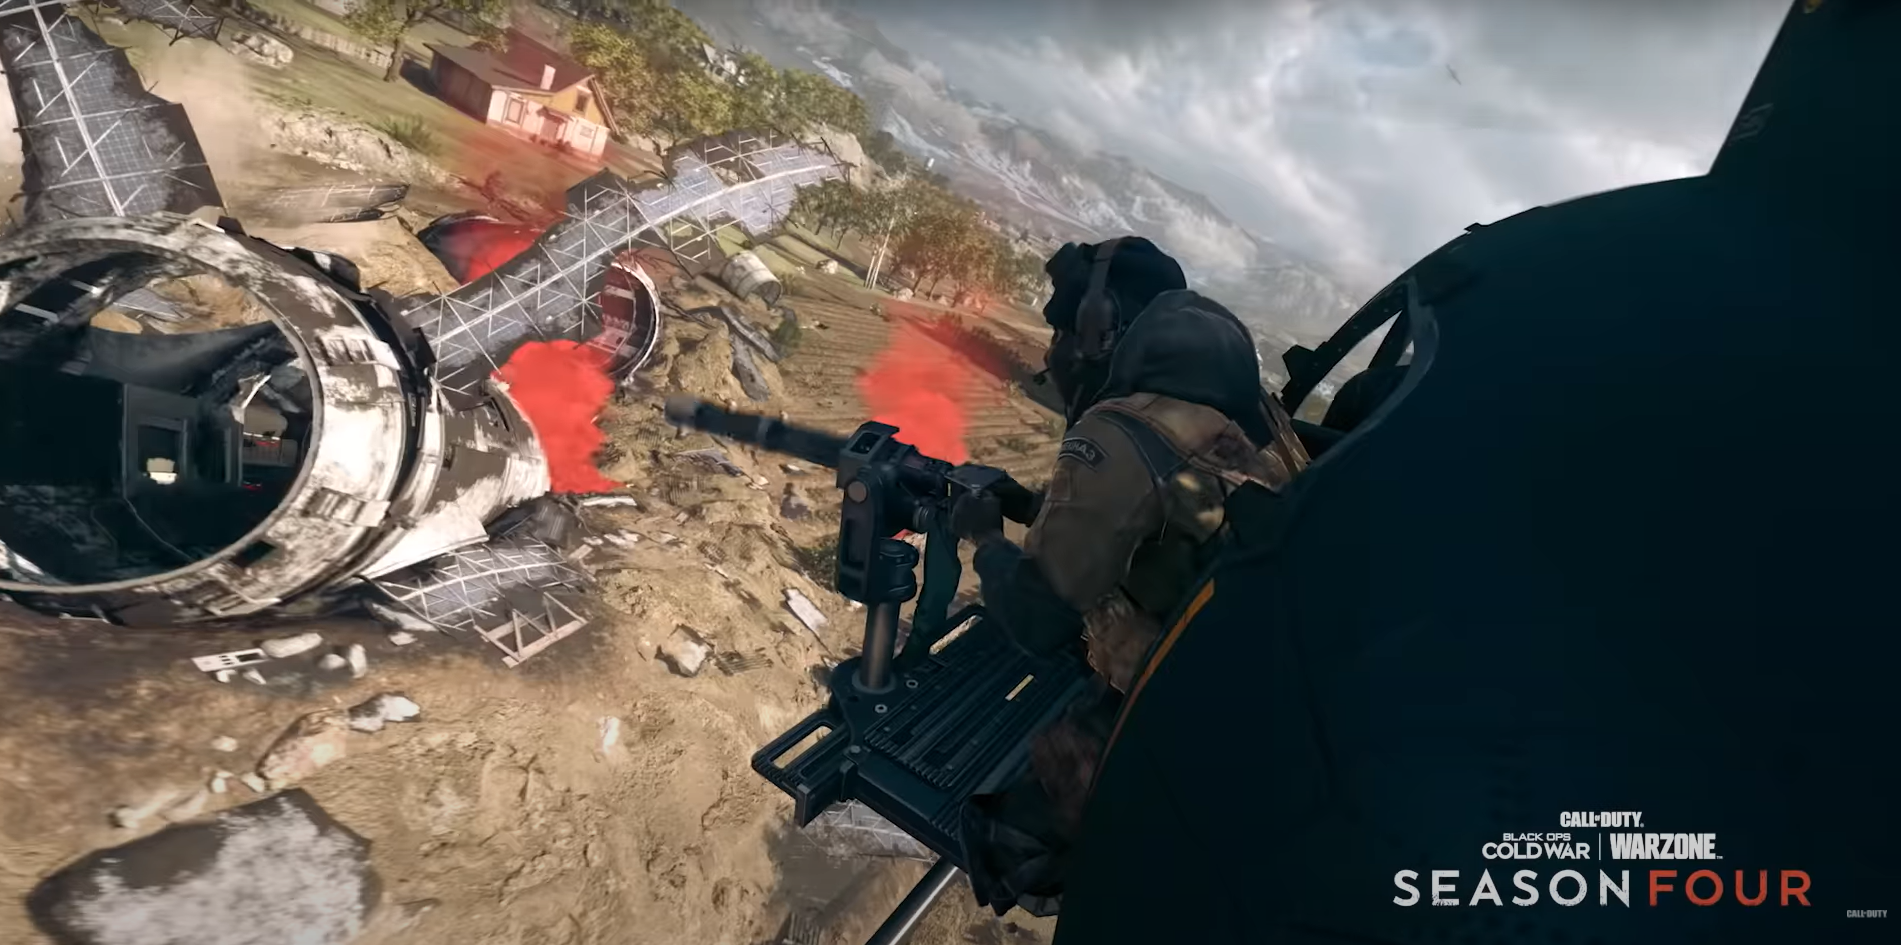 Call of Duty Warzone saison 4